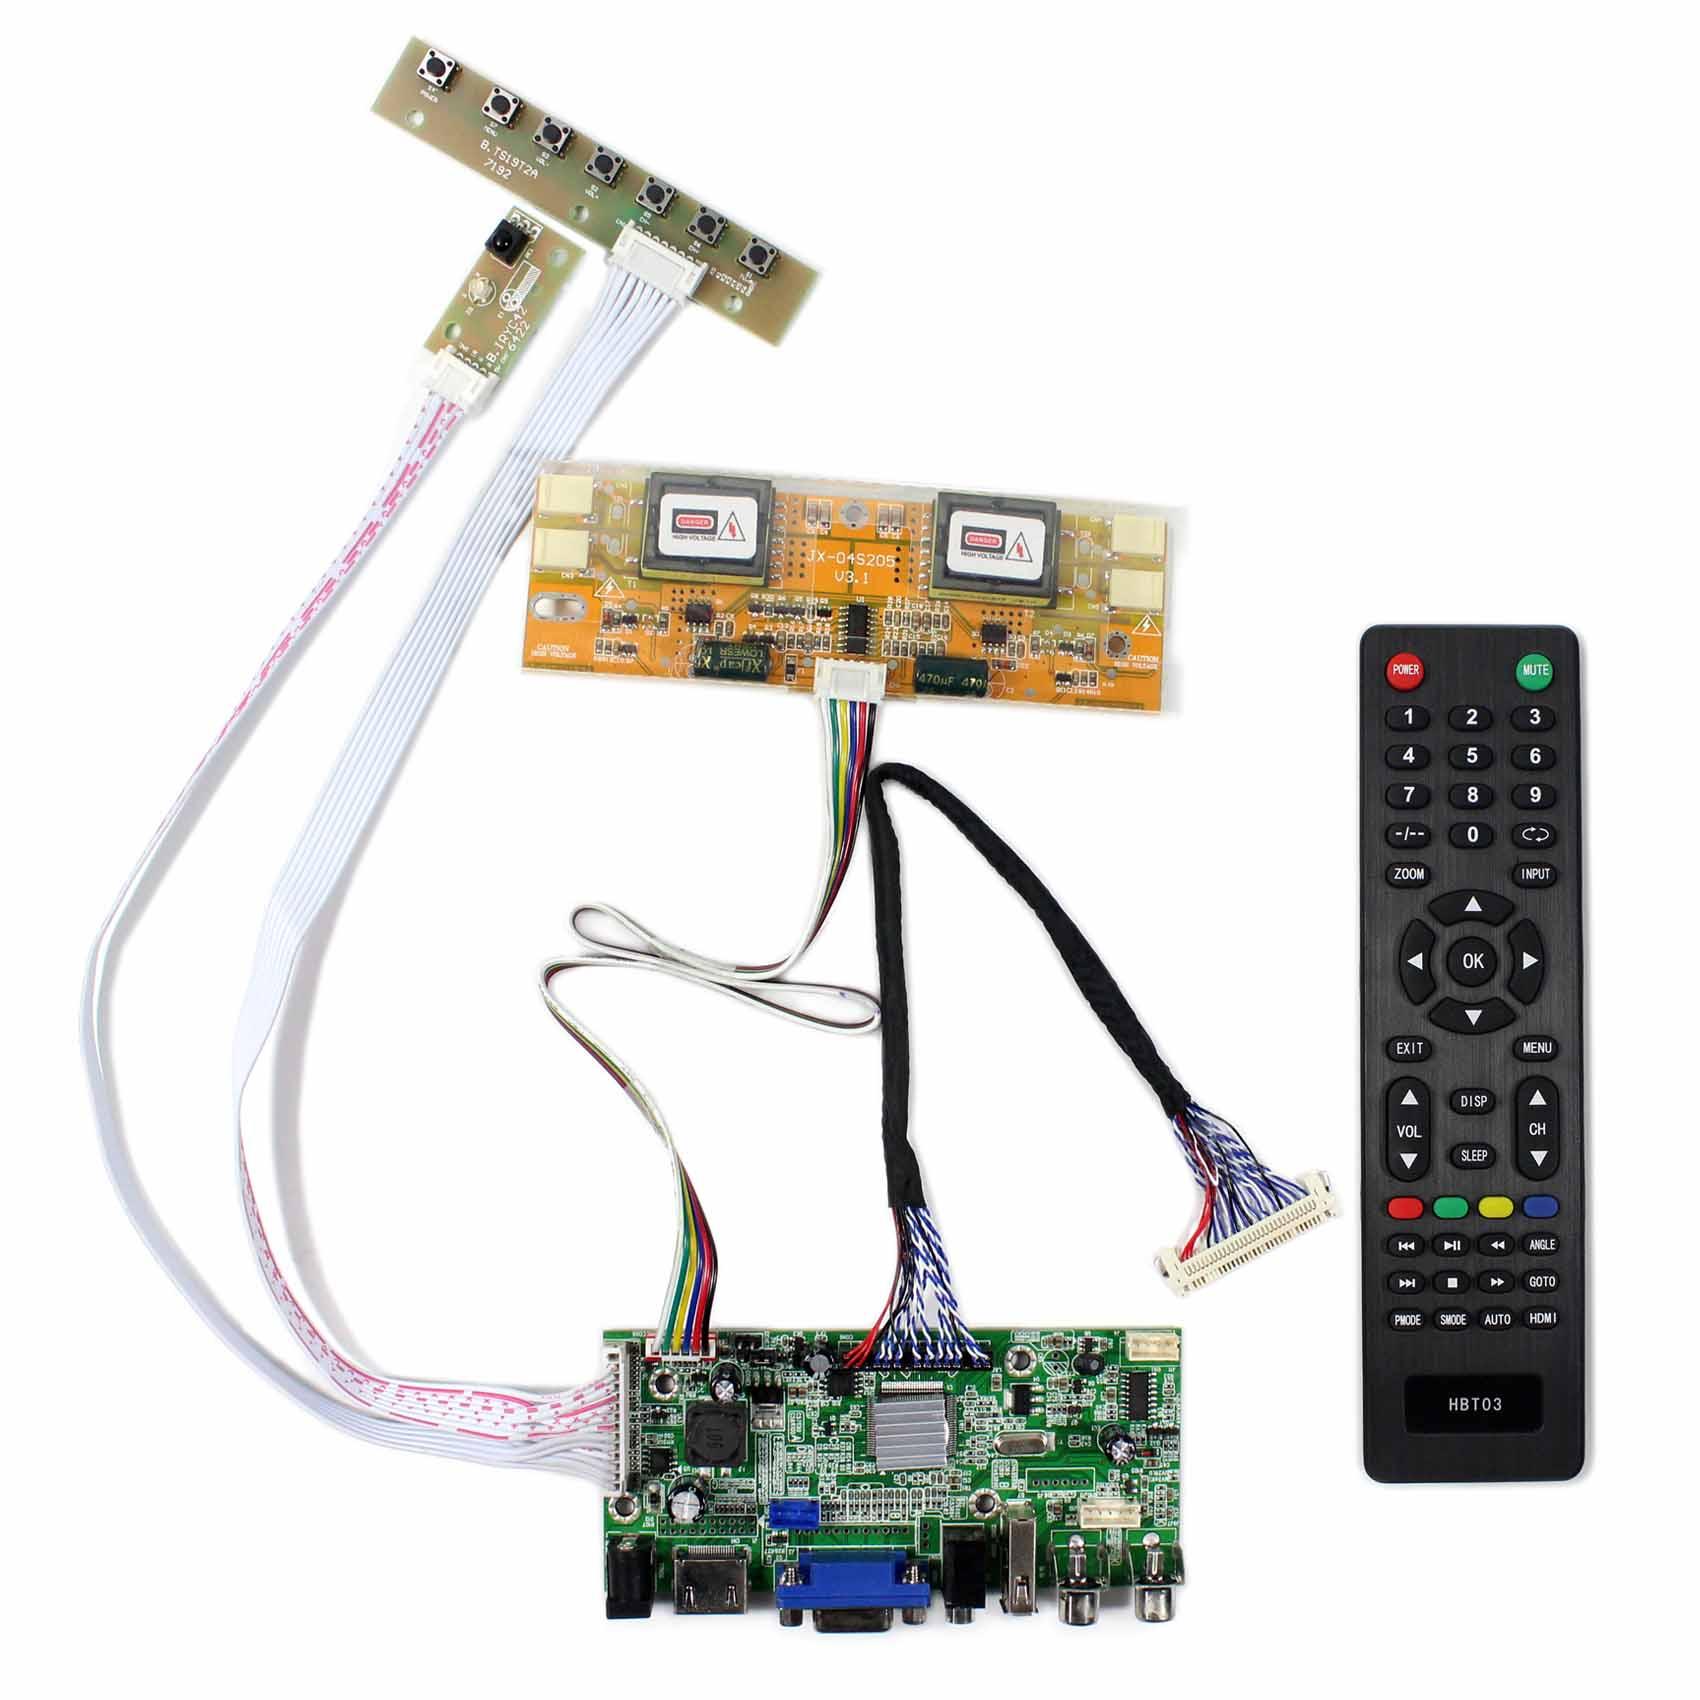 HDMI + VGA + 2AV + USB + аудио ЖК-дисплей плате контроллера для 17 дюймов 19 дюймов 1280x1024 m170EG01 LM190E02 ЖК-дисплей Экран